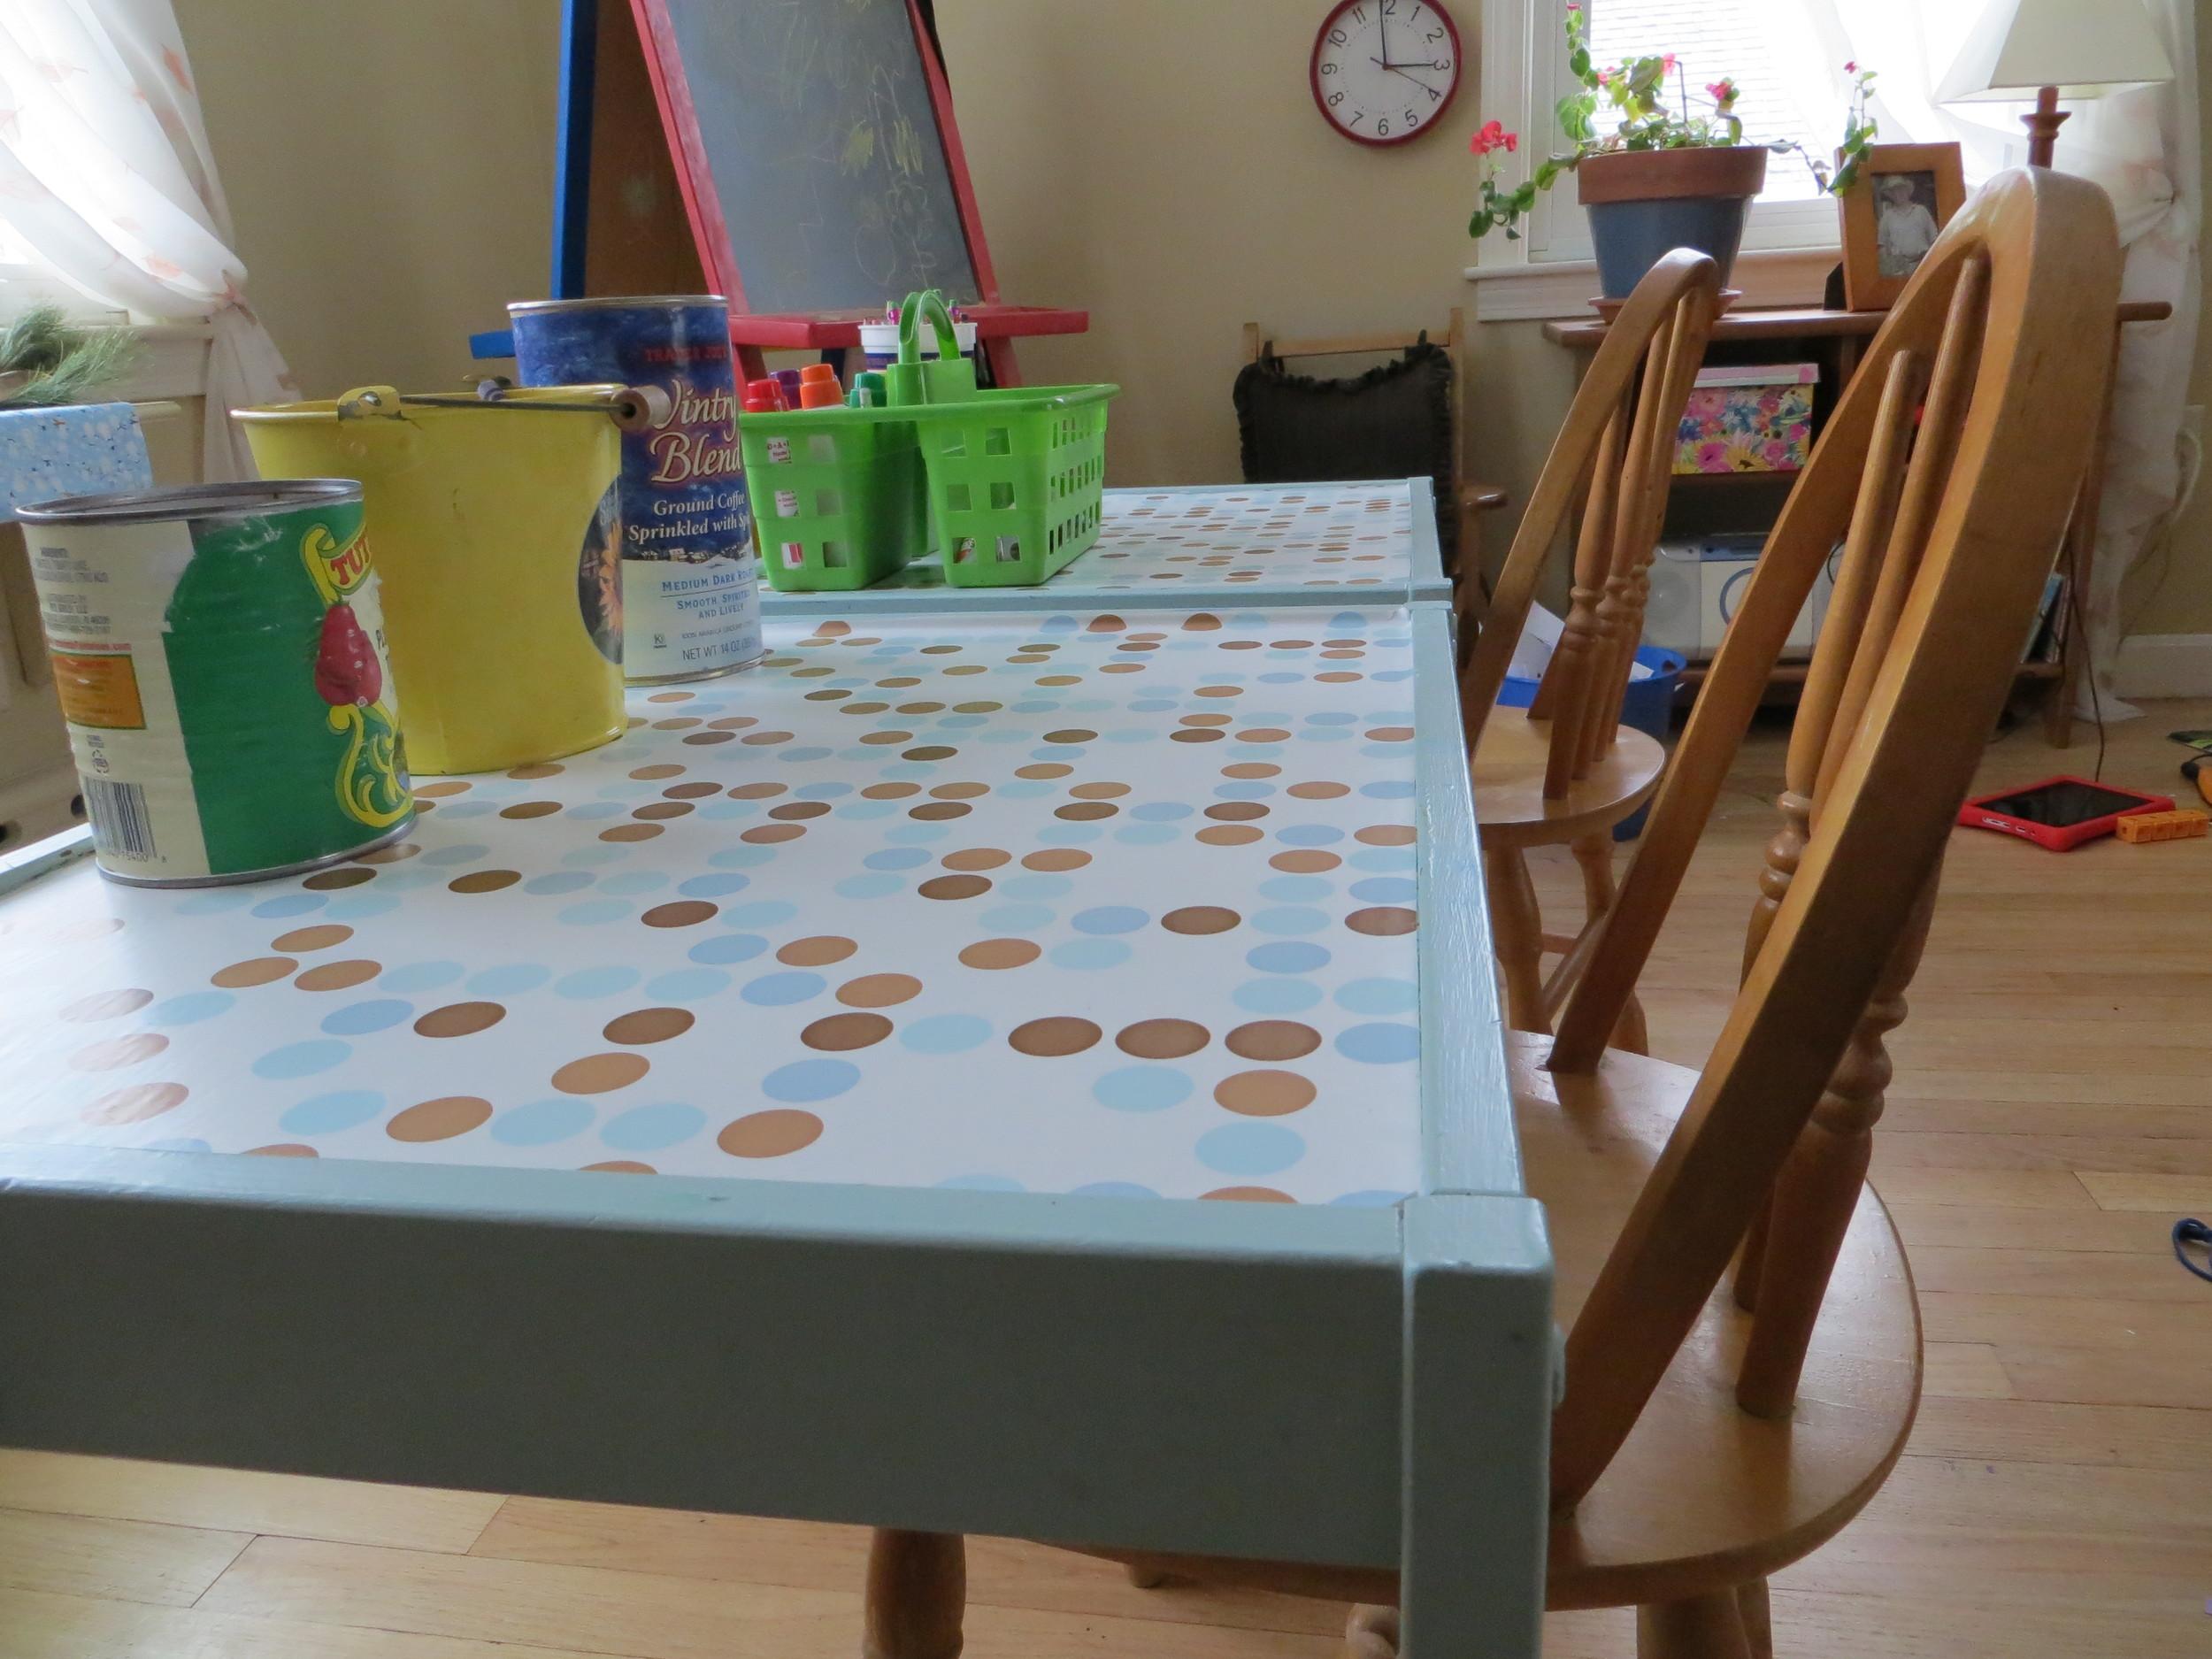 IKEA_table2